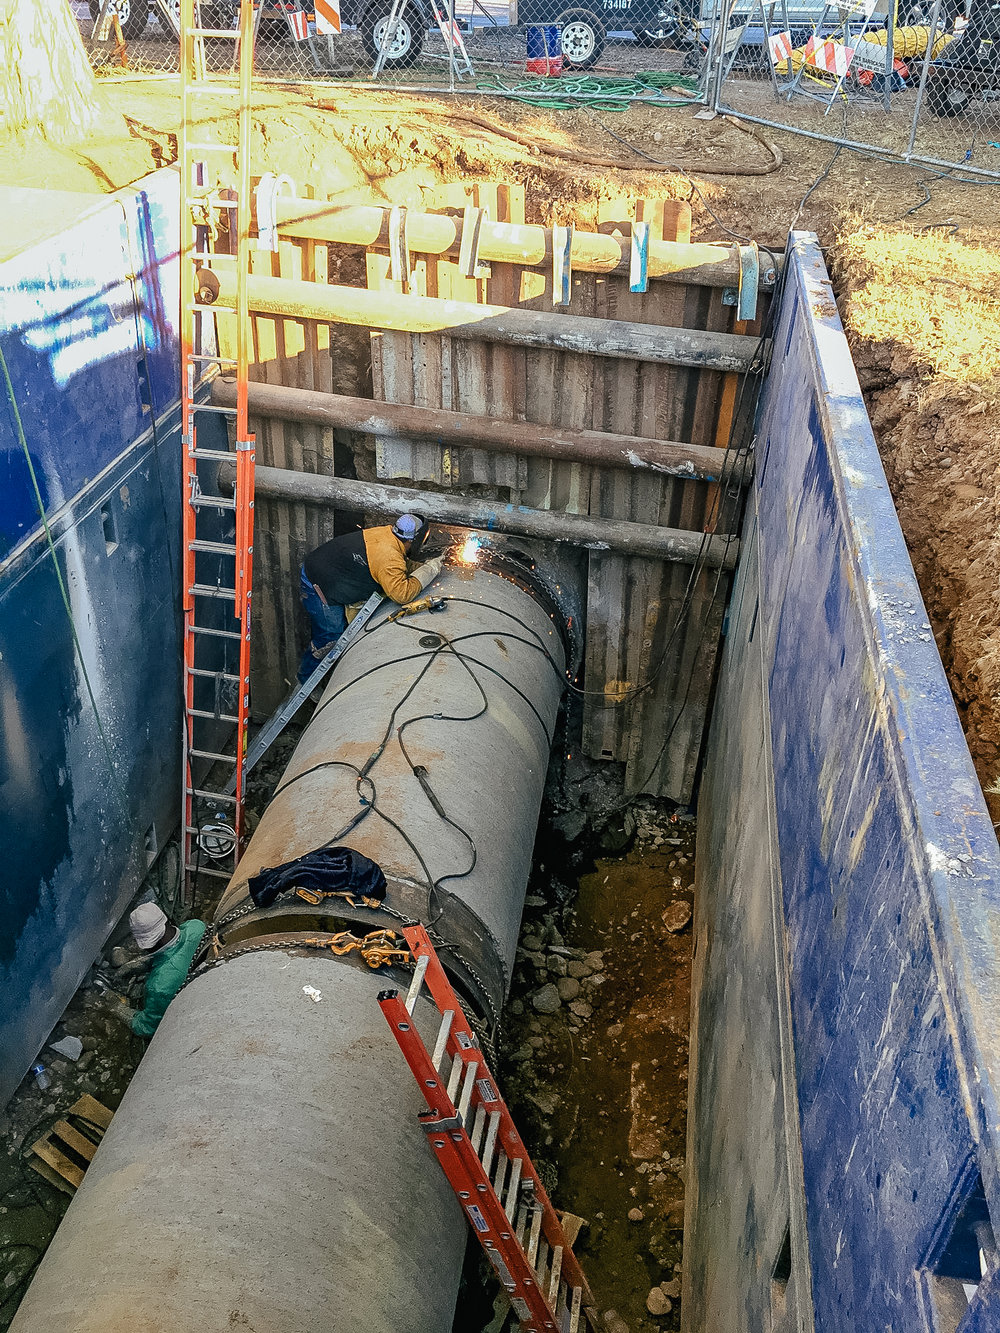 3520100 Water Transmission Main Assess JOC-2.jpg